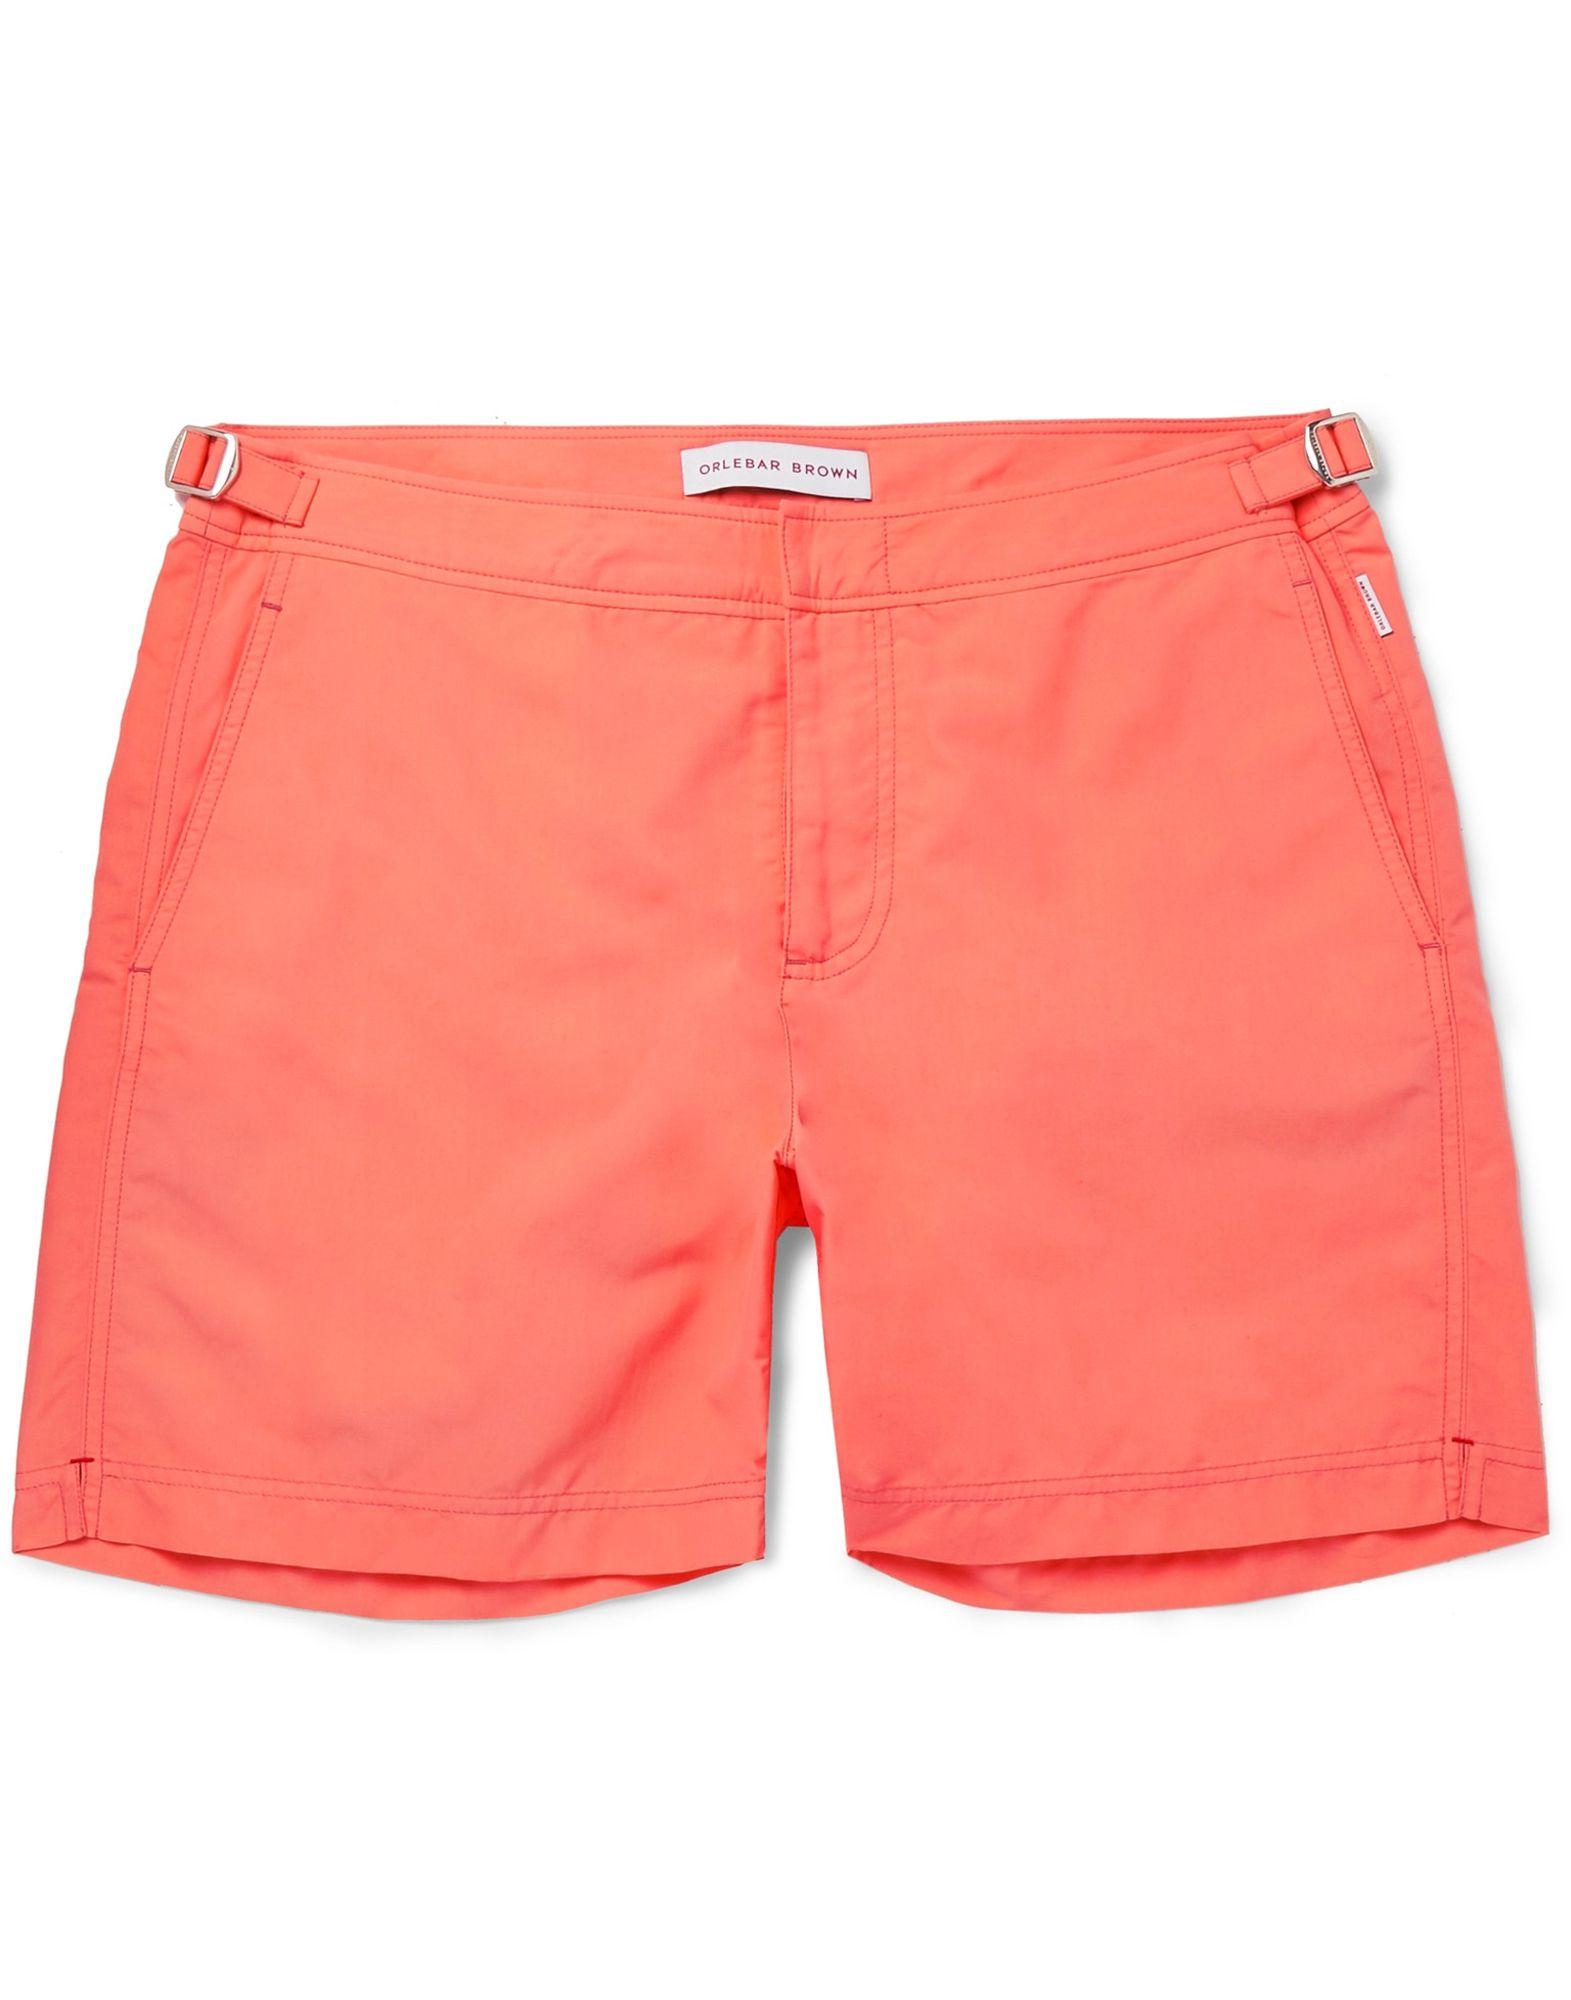 ORLEBAR BROWN Swim trunks - Item 47271360